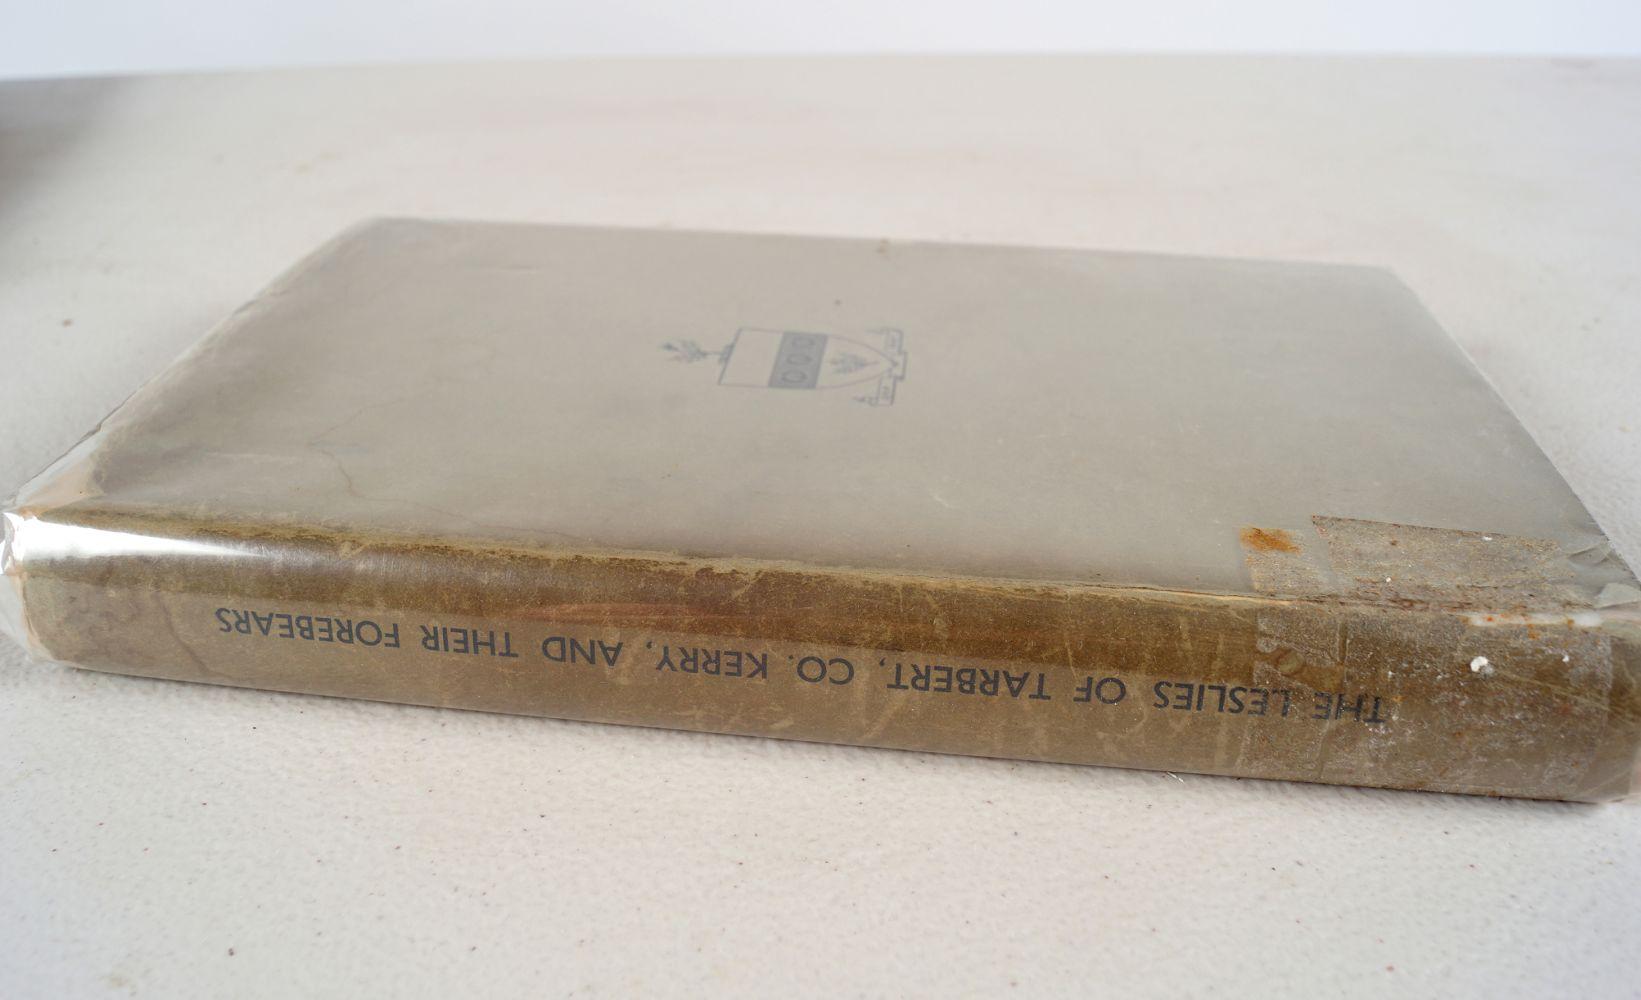 BOOK: THE LESLIES OF TARBERT CO. KERRY